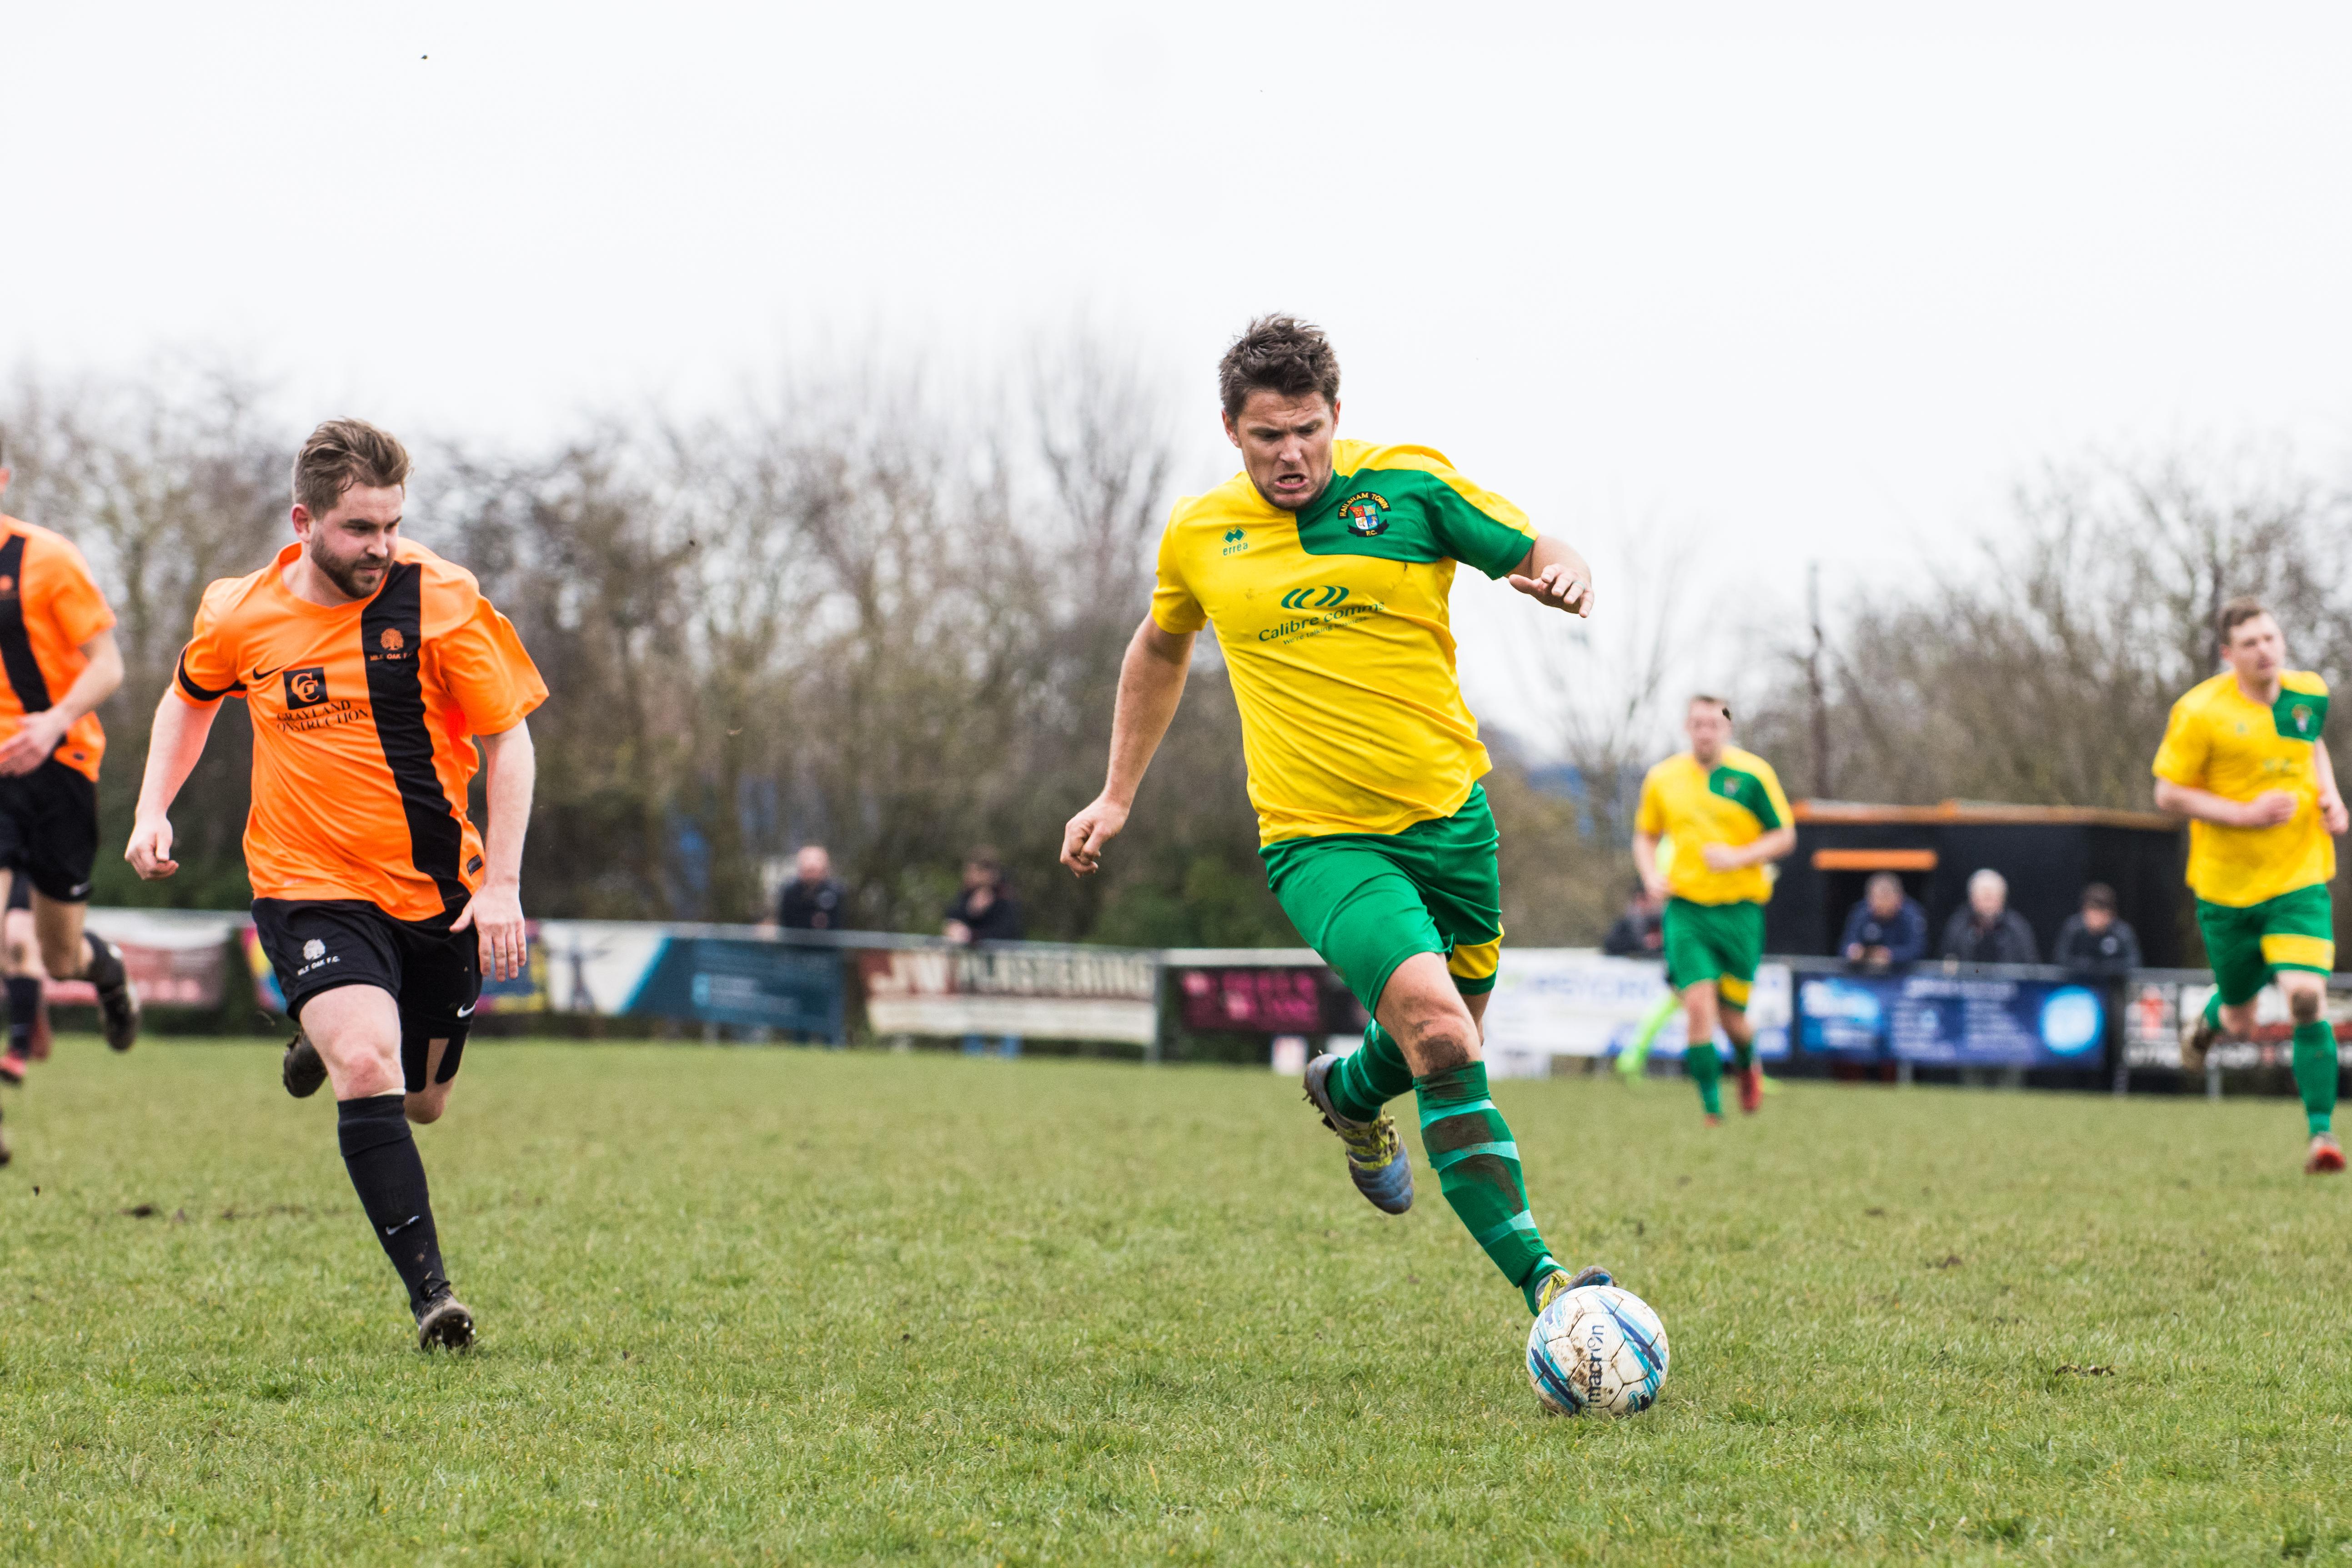 DAVID_JEFFERY Mile Oak FC vs Hailsham Town FC 24.03.18 79